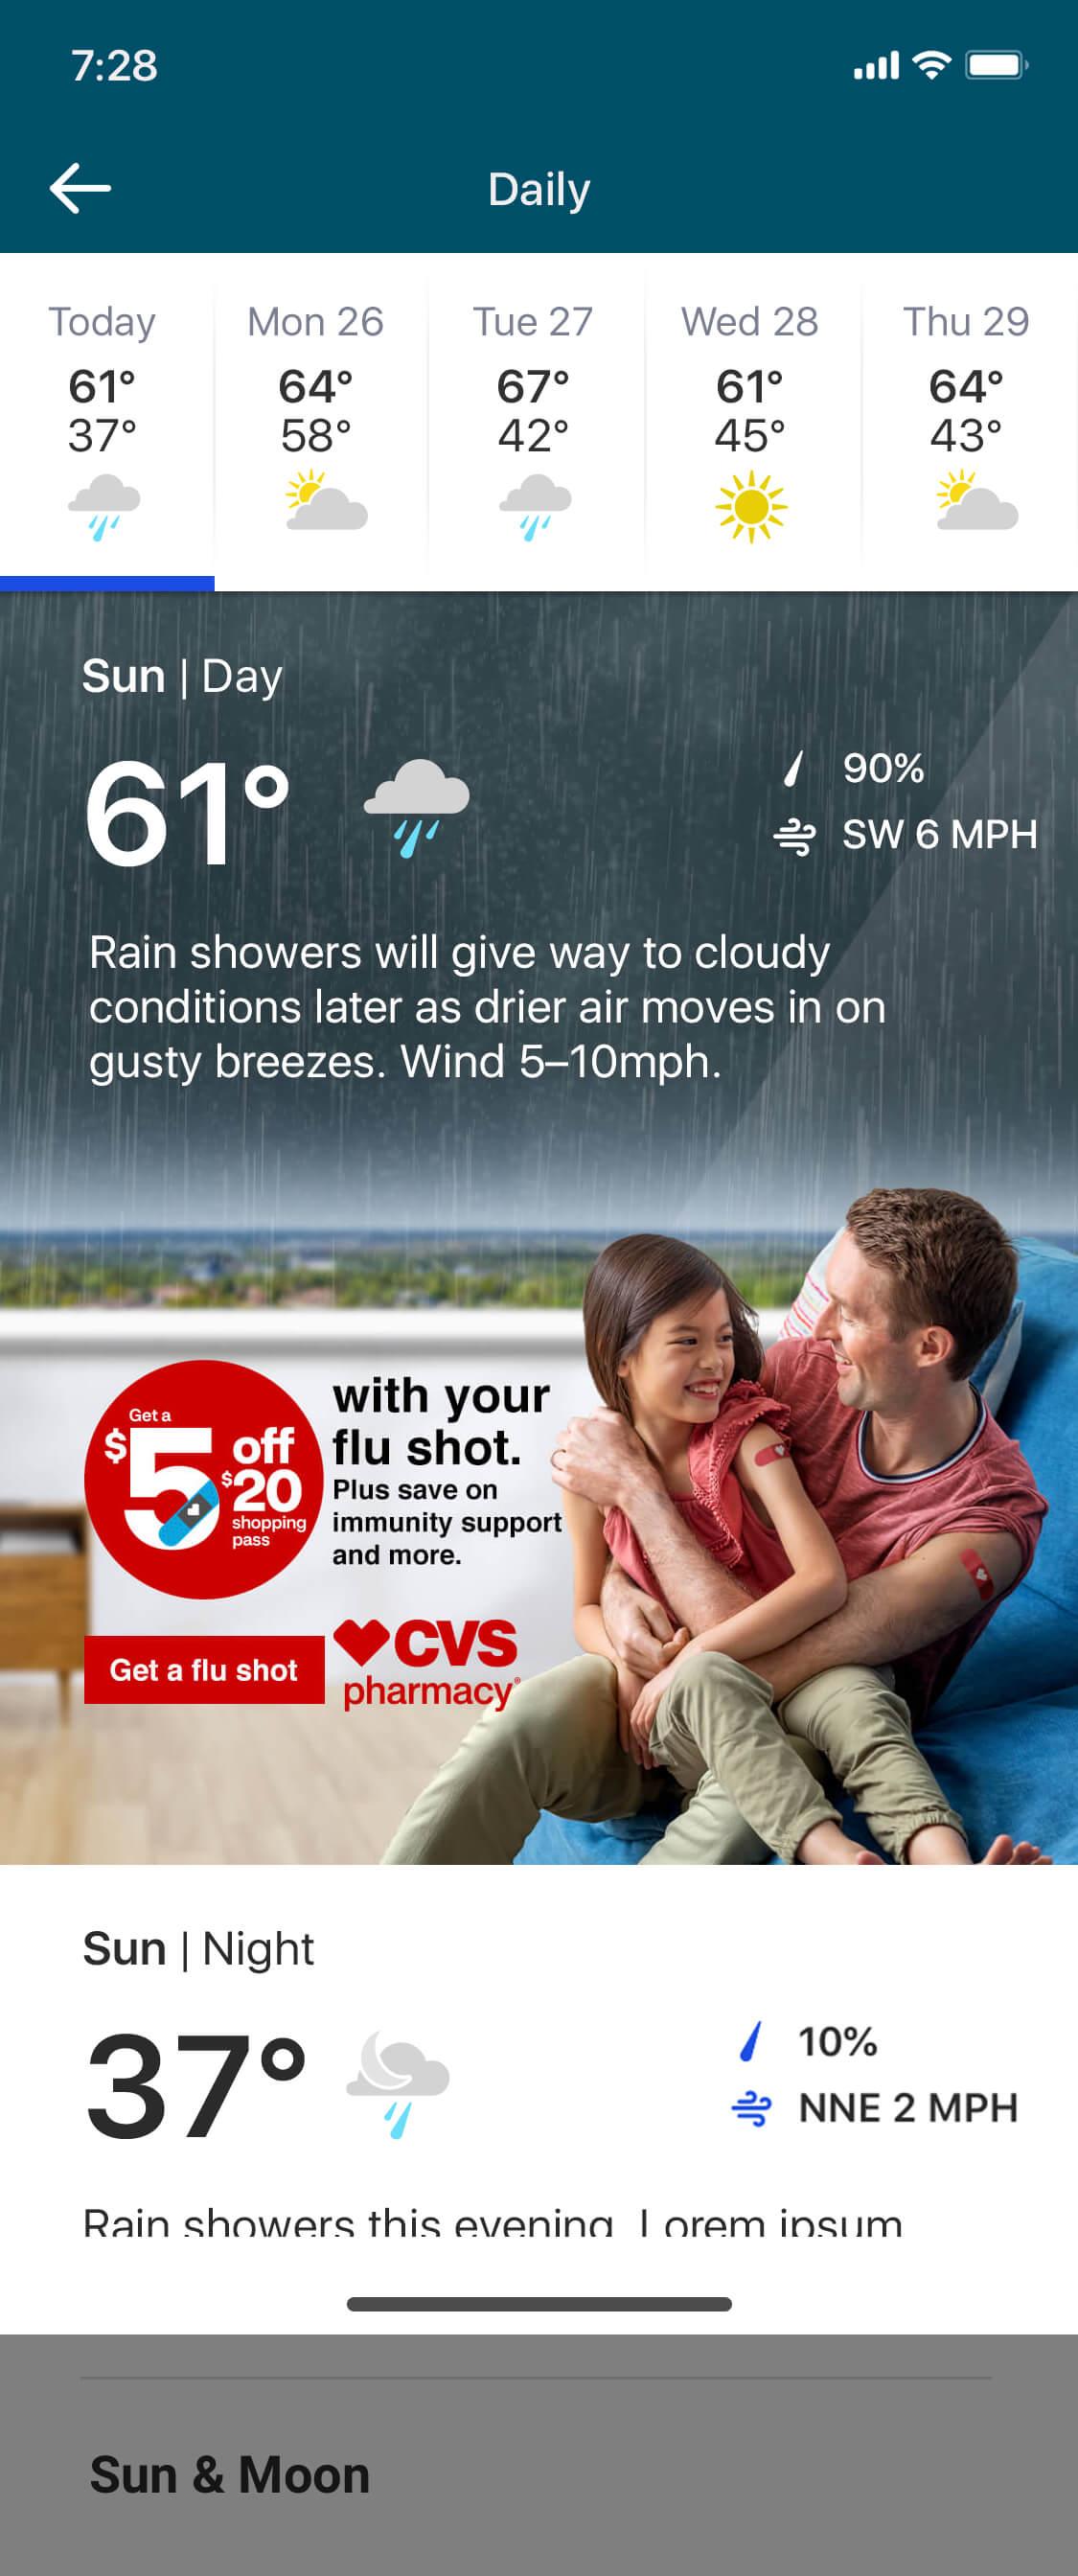 CVS - IDD-week_ahead-rain-d